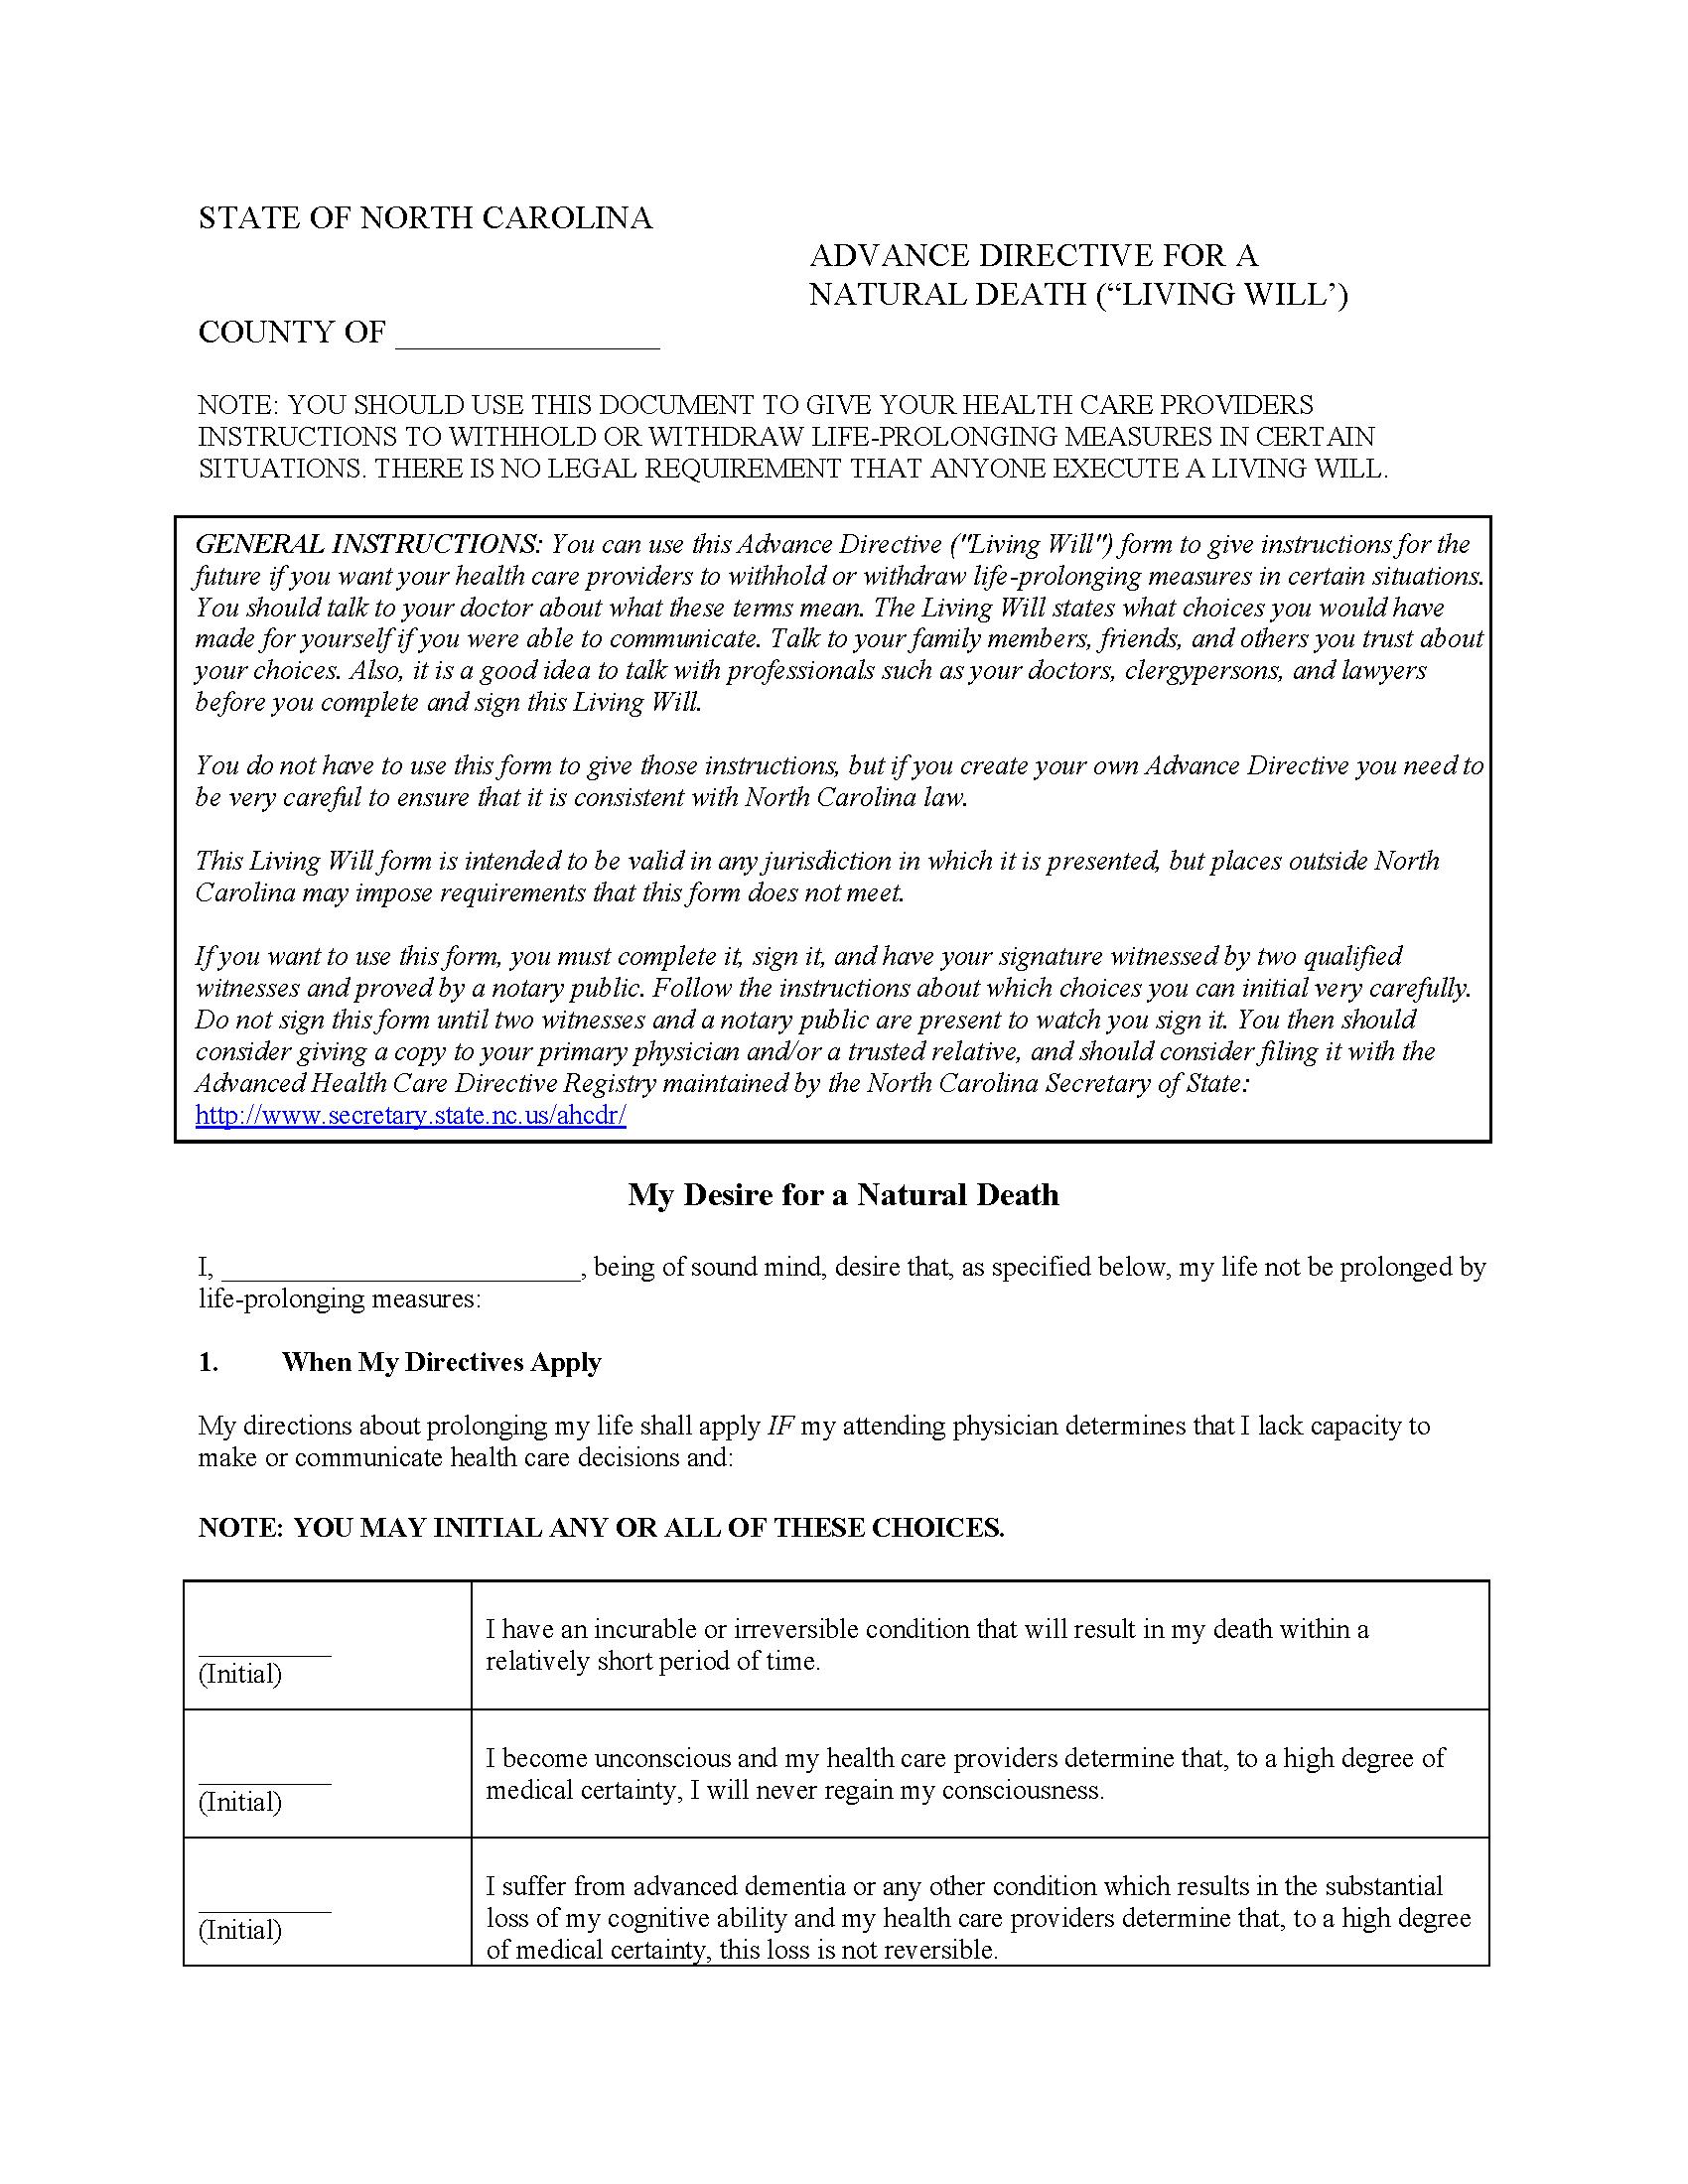 North Carolina Advance Directive For Health Care